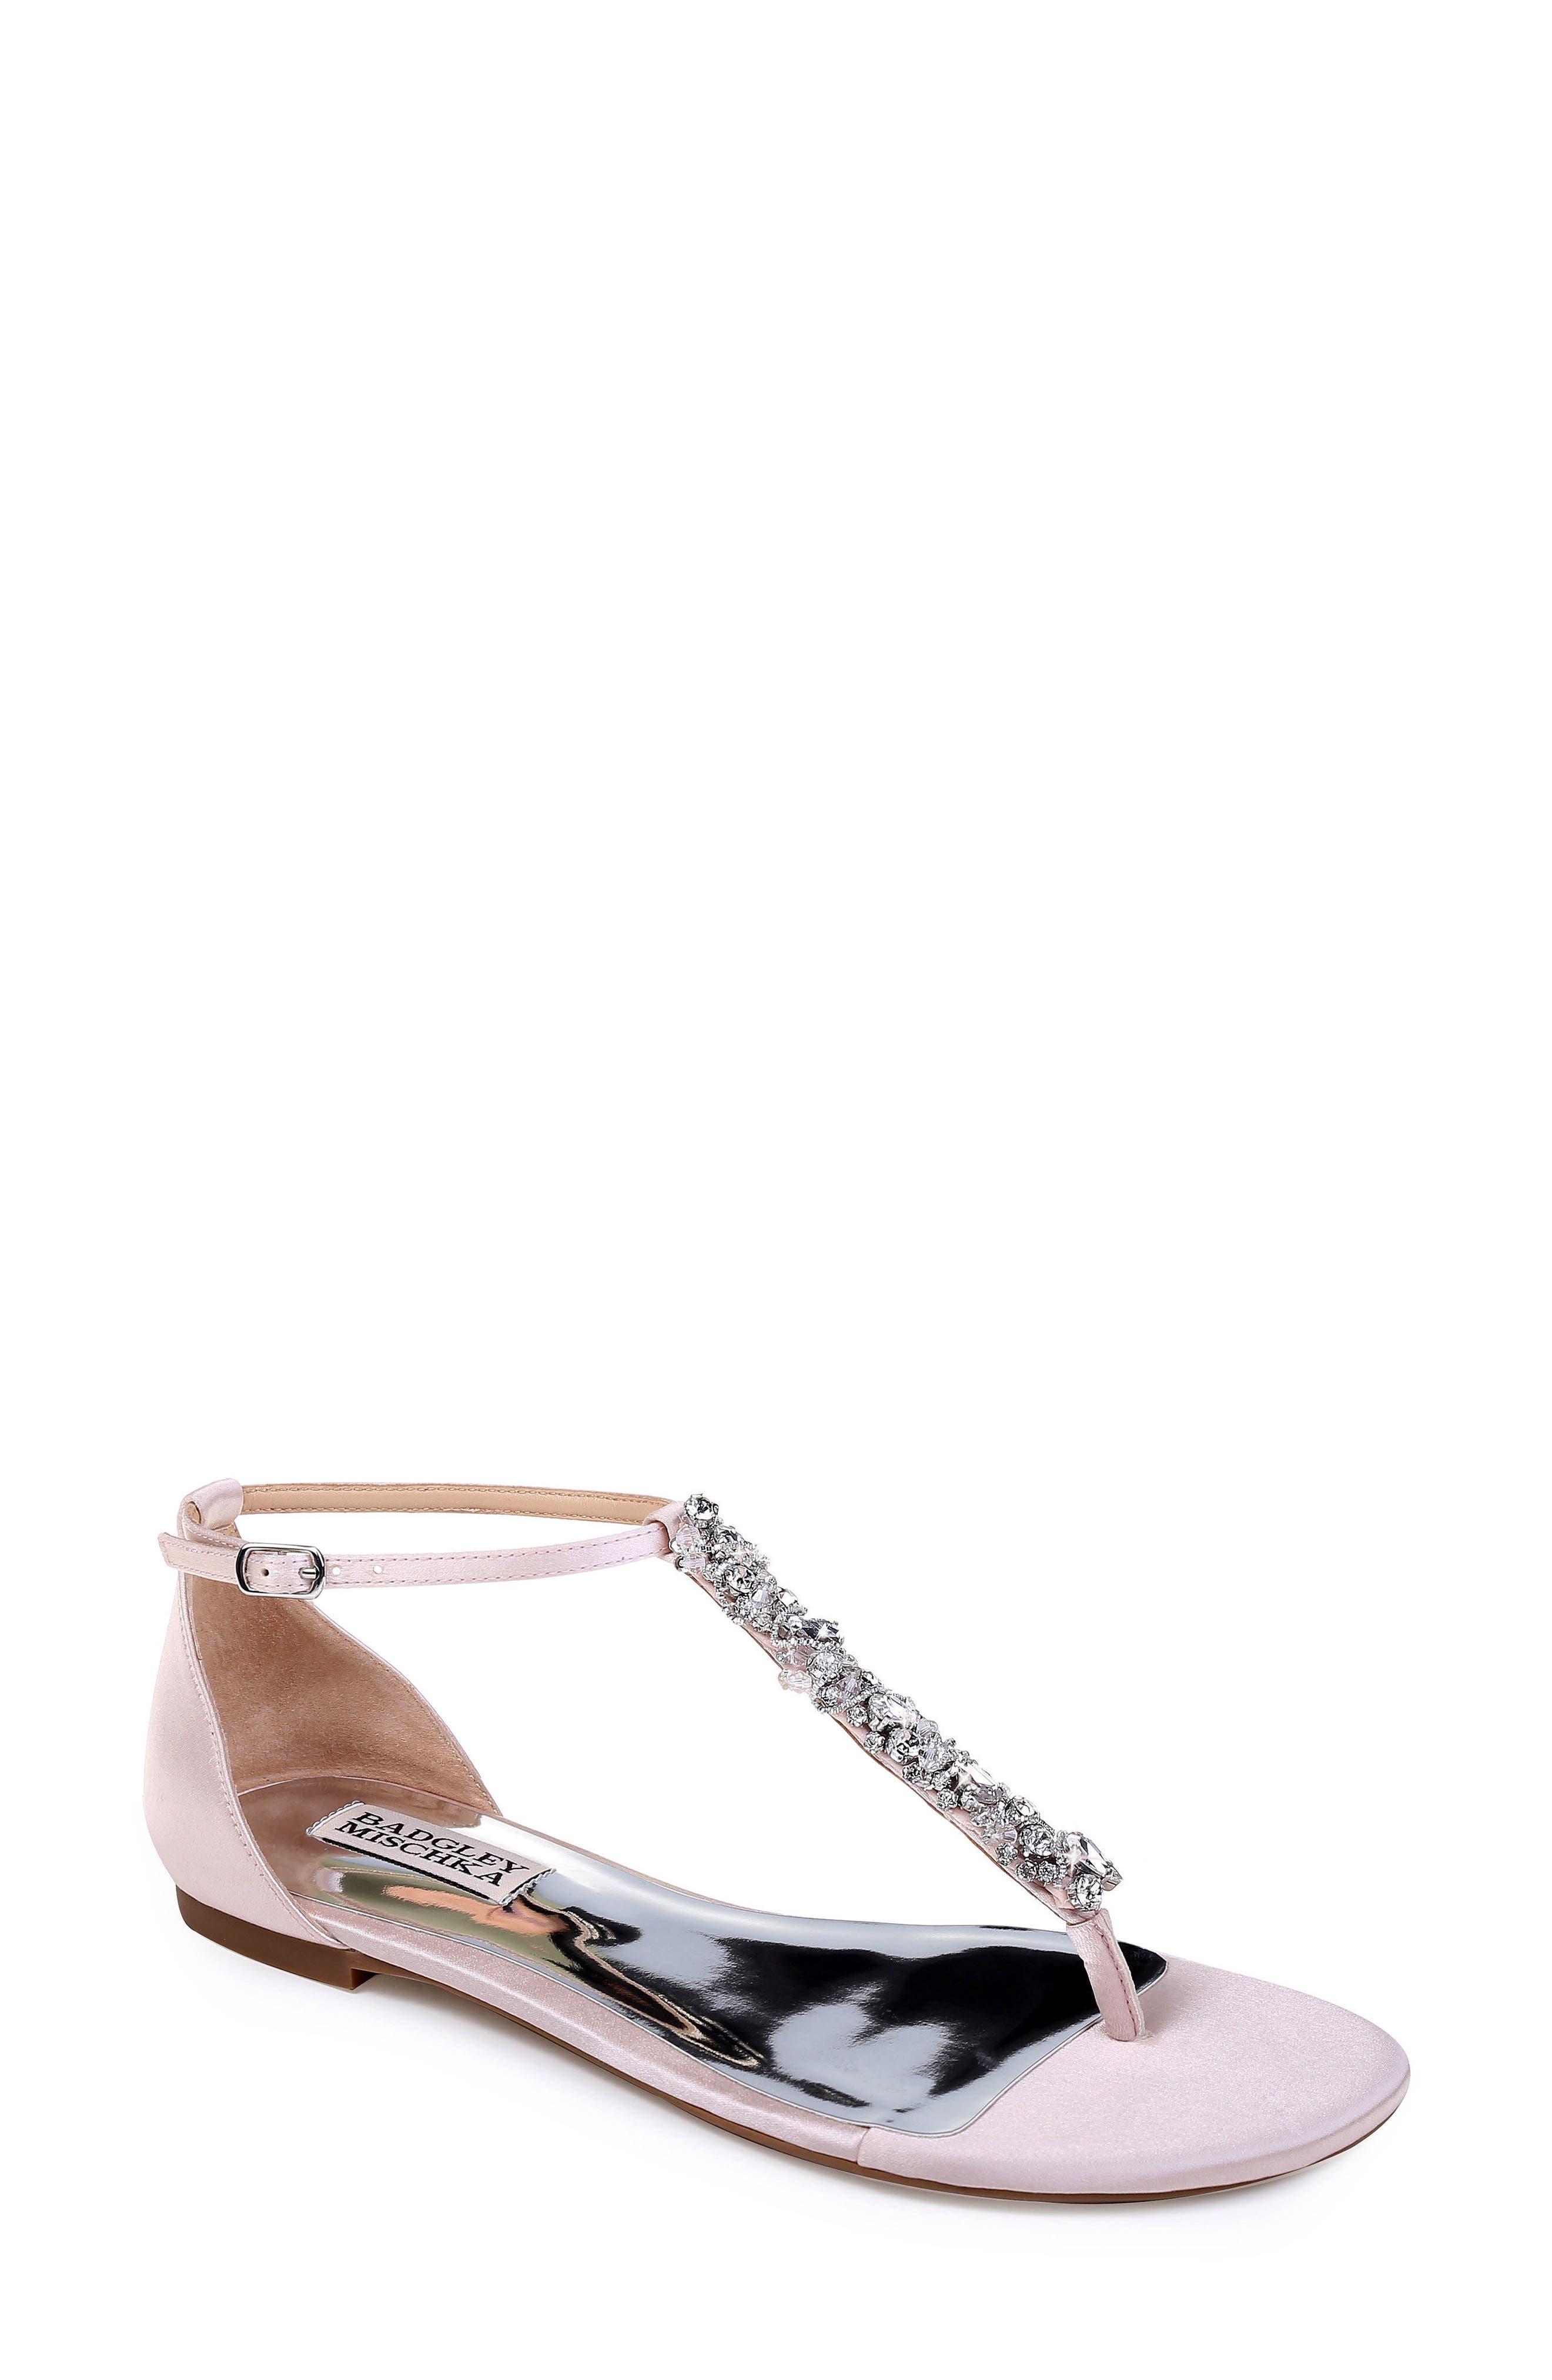 Main Image - Badgley Mischka Holbrook T-Strap Sandal (Women)